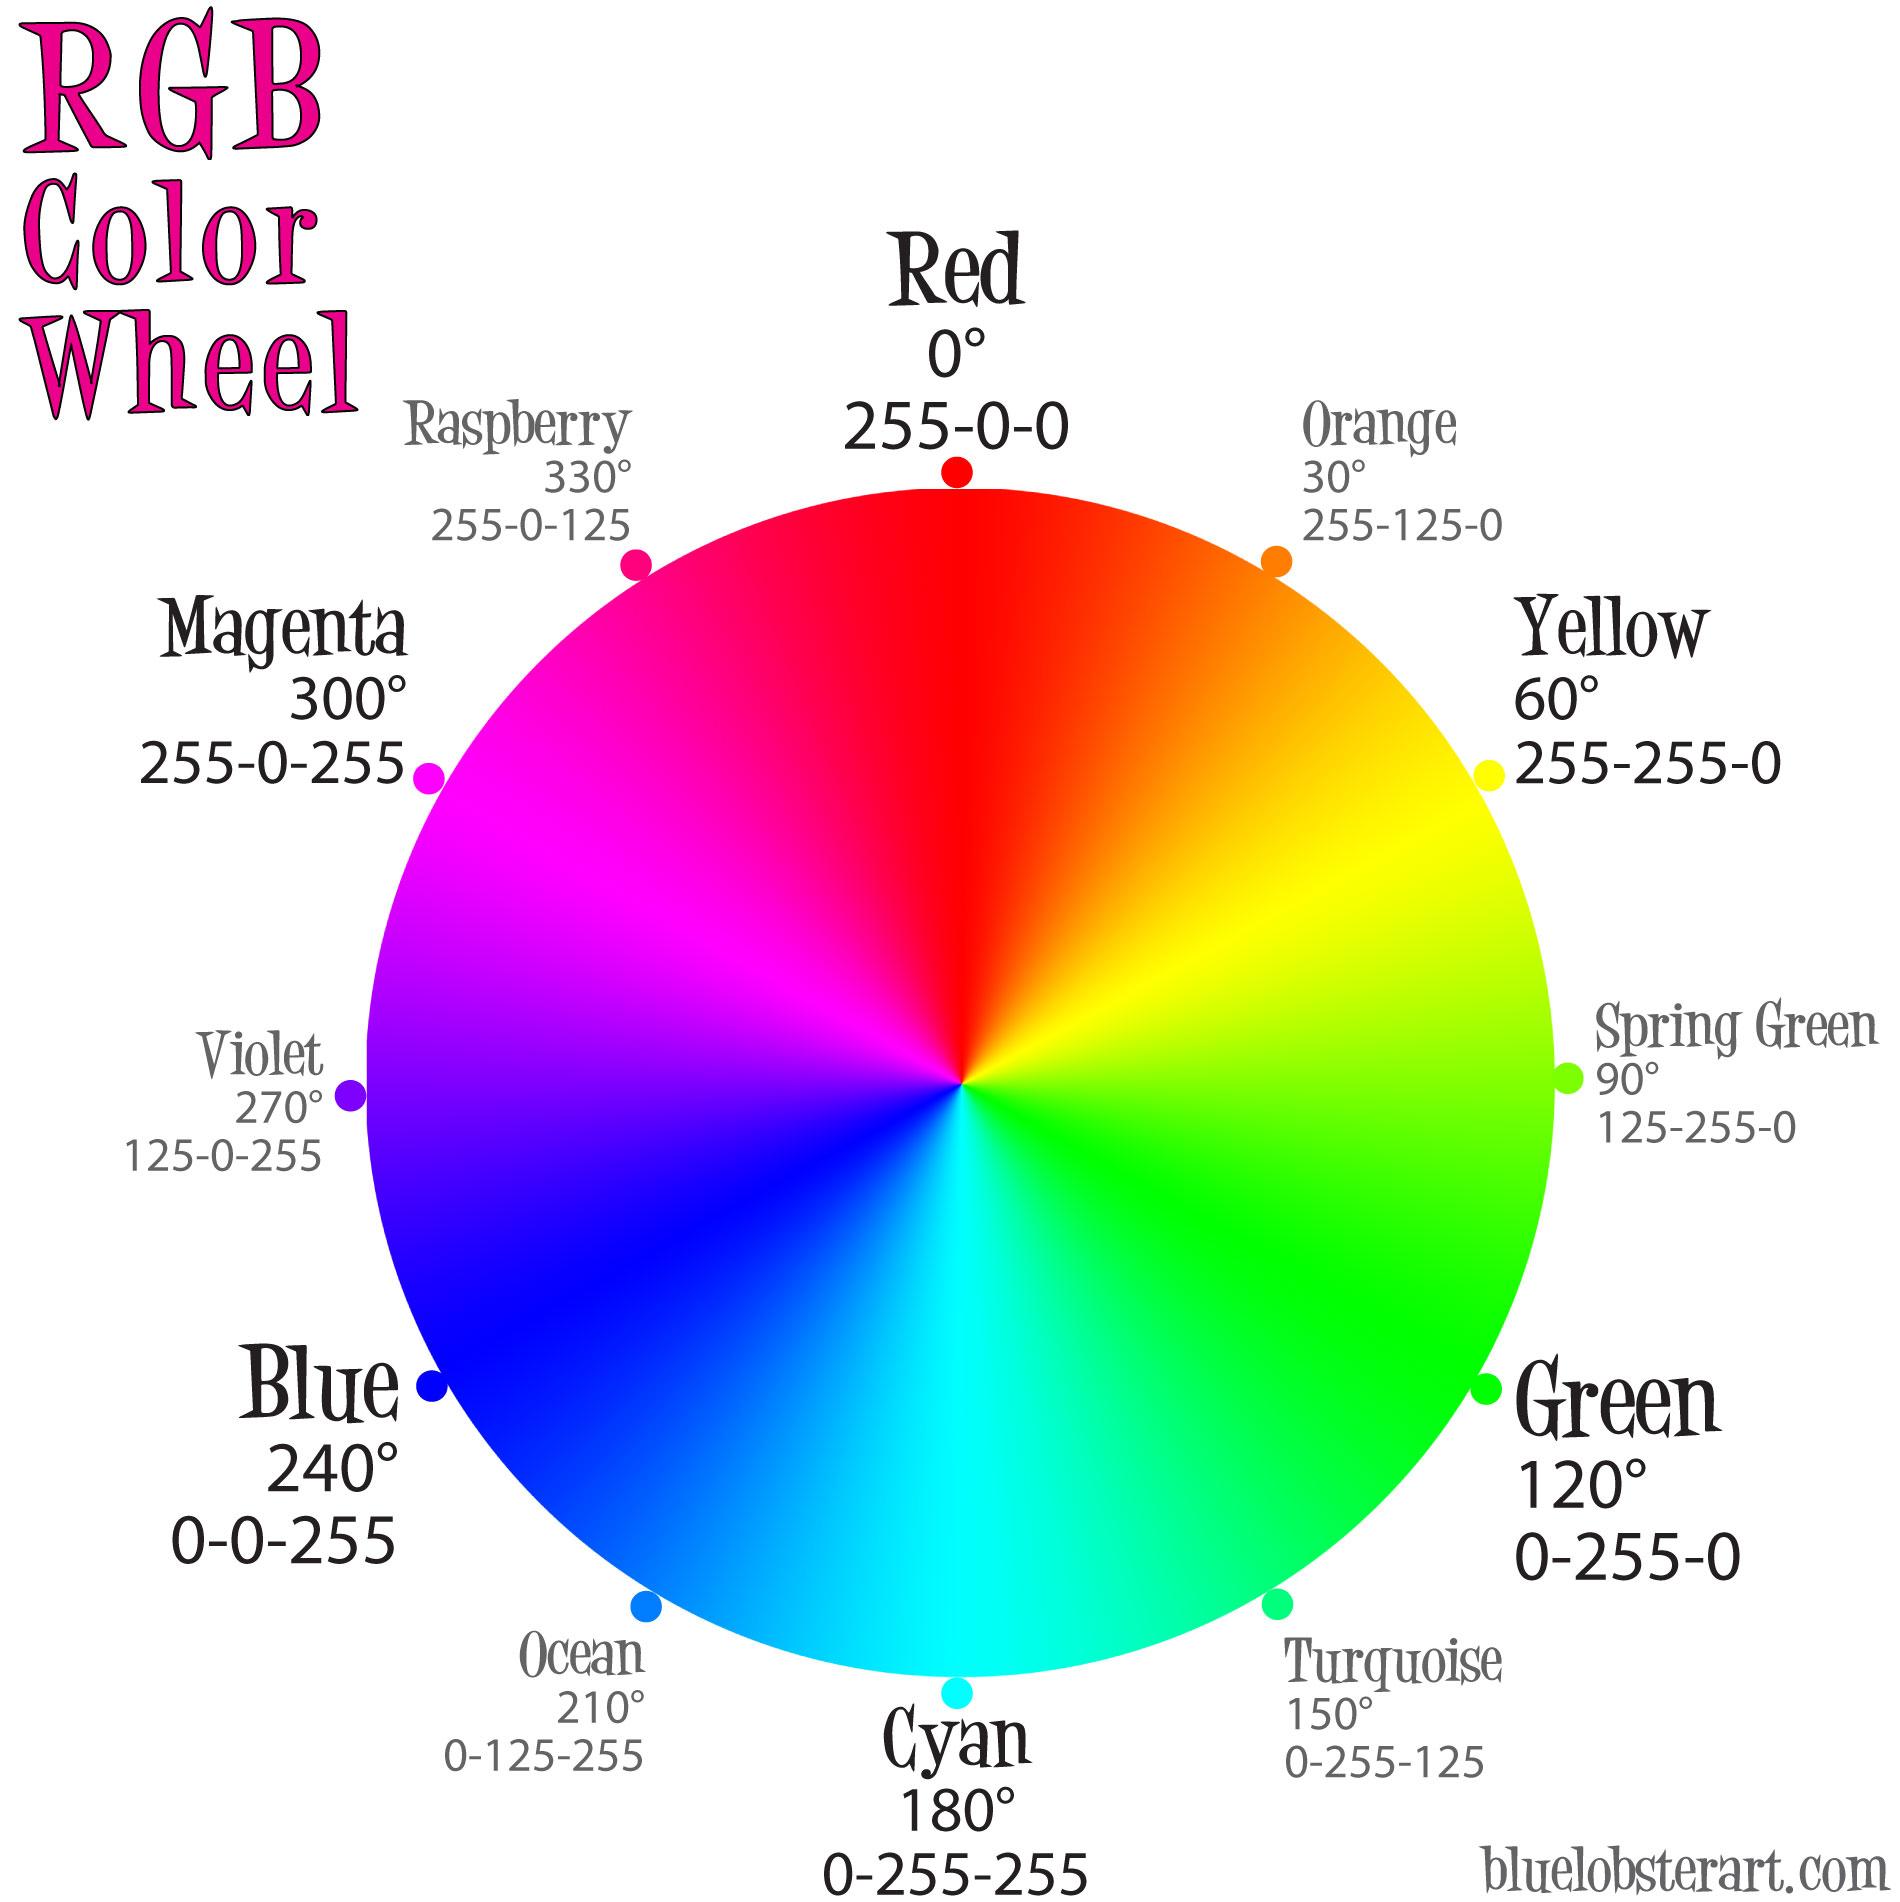 The Rgb Color Wheel